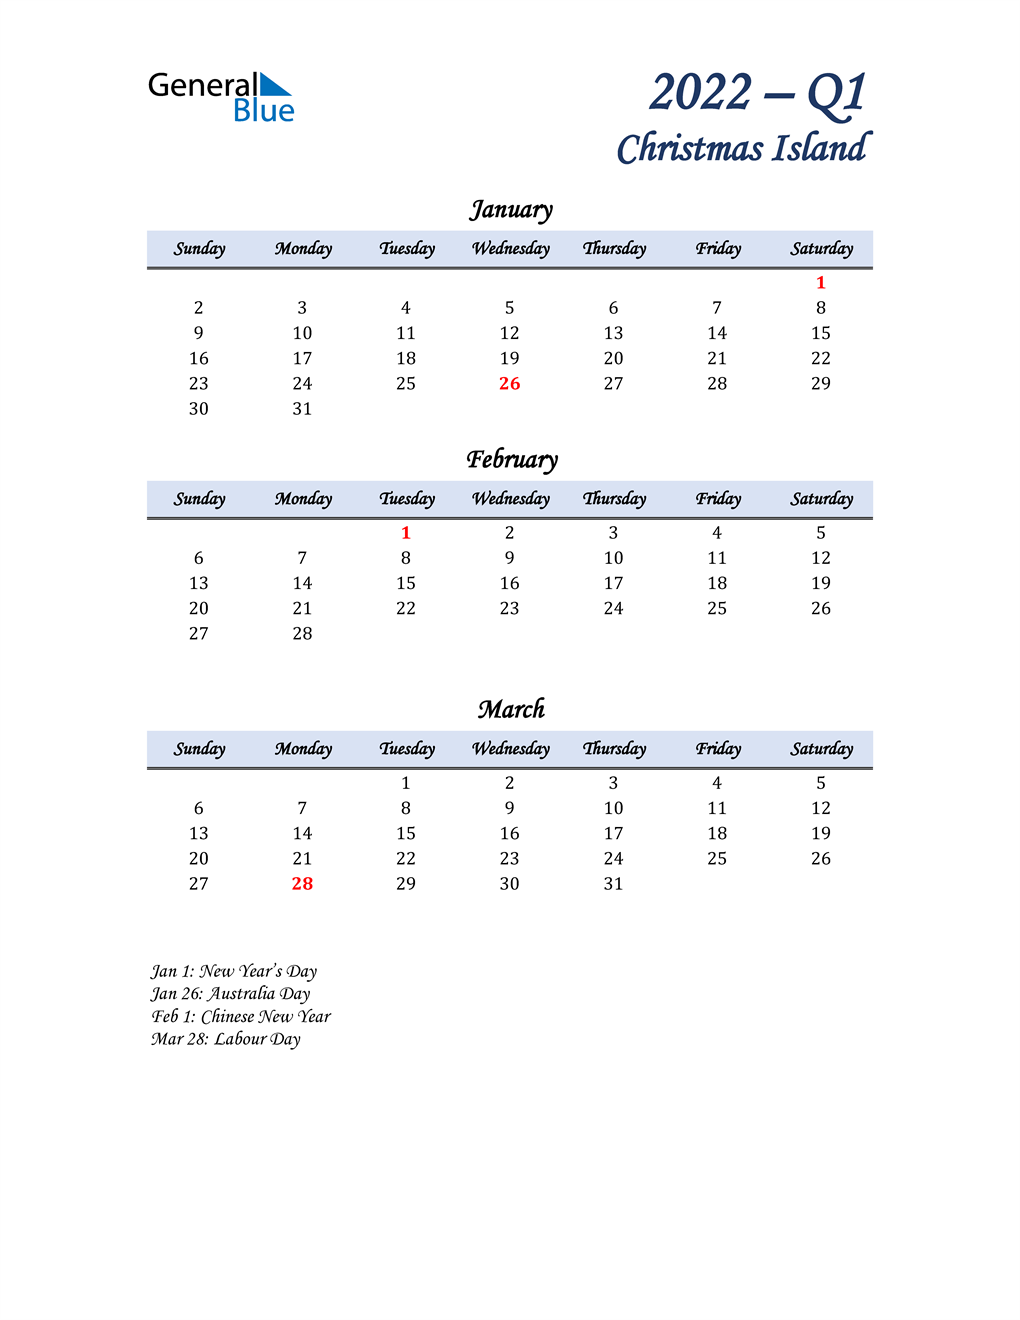 January, February, and March Calendar for Christmas Island